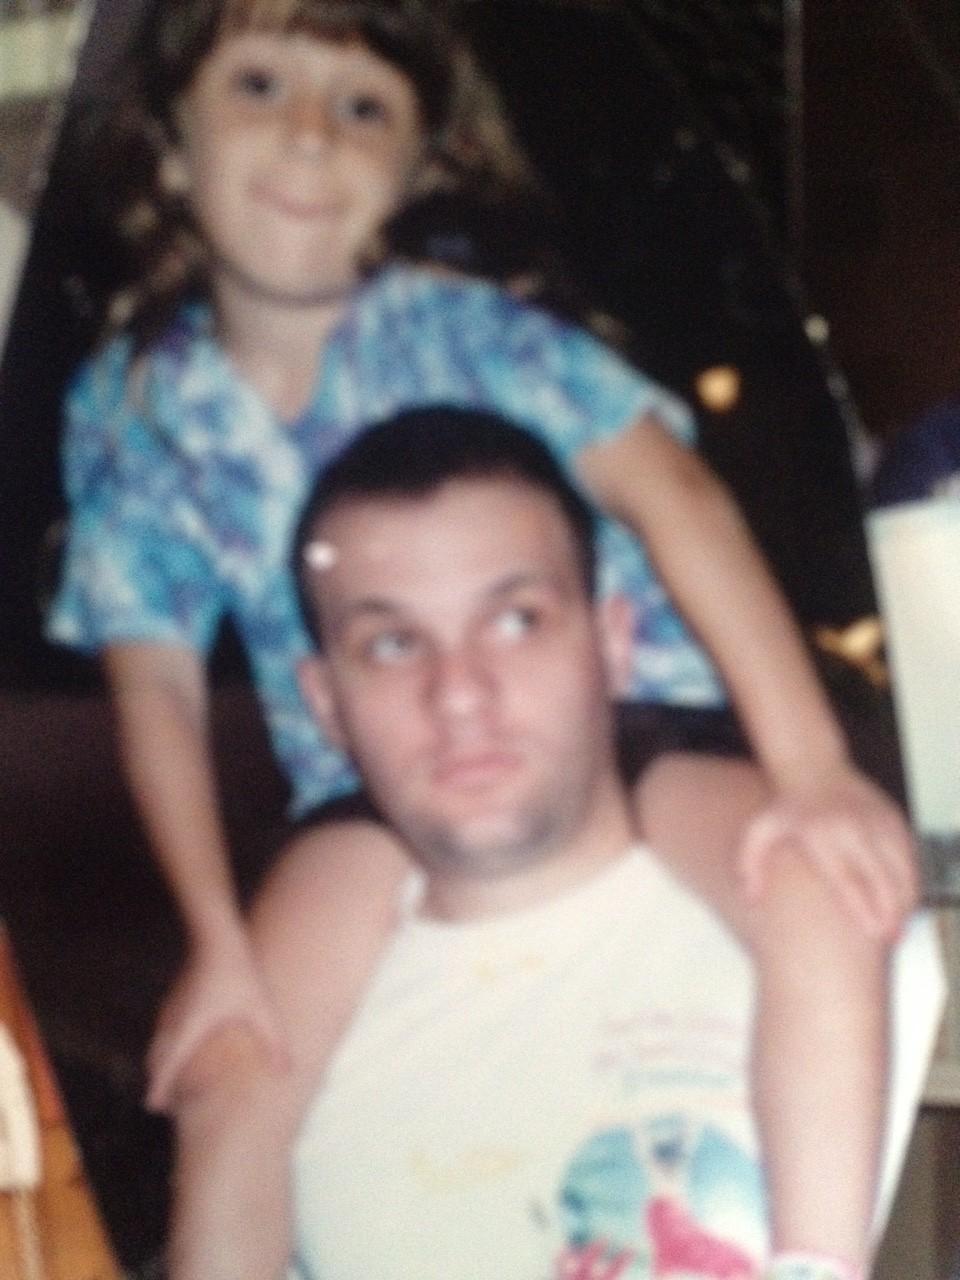 Fred Samantha 1990s